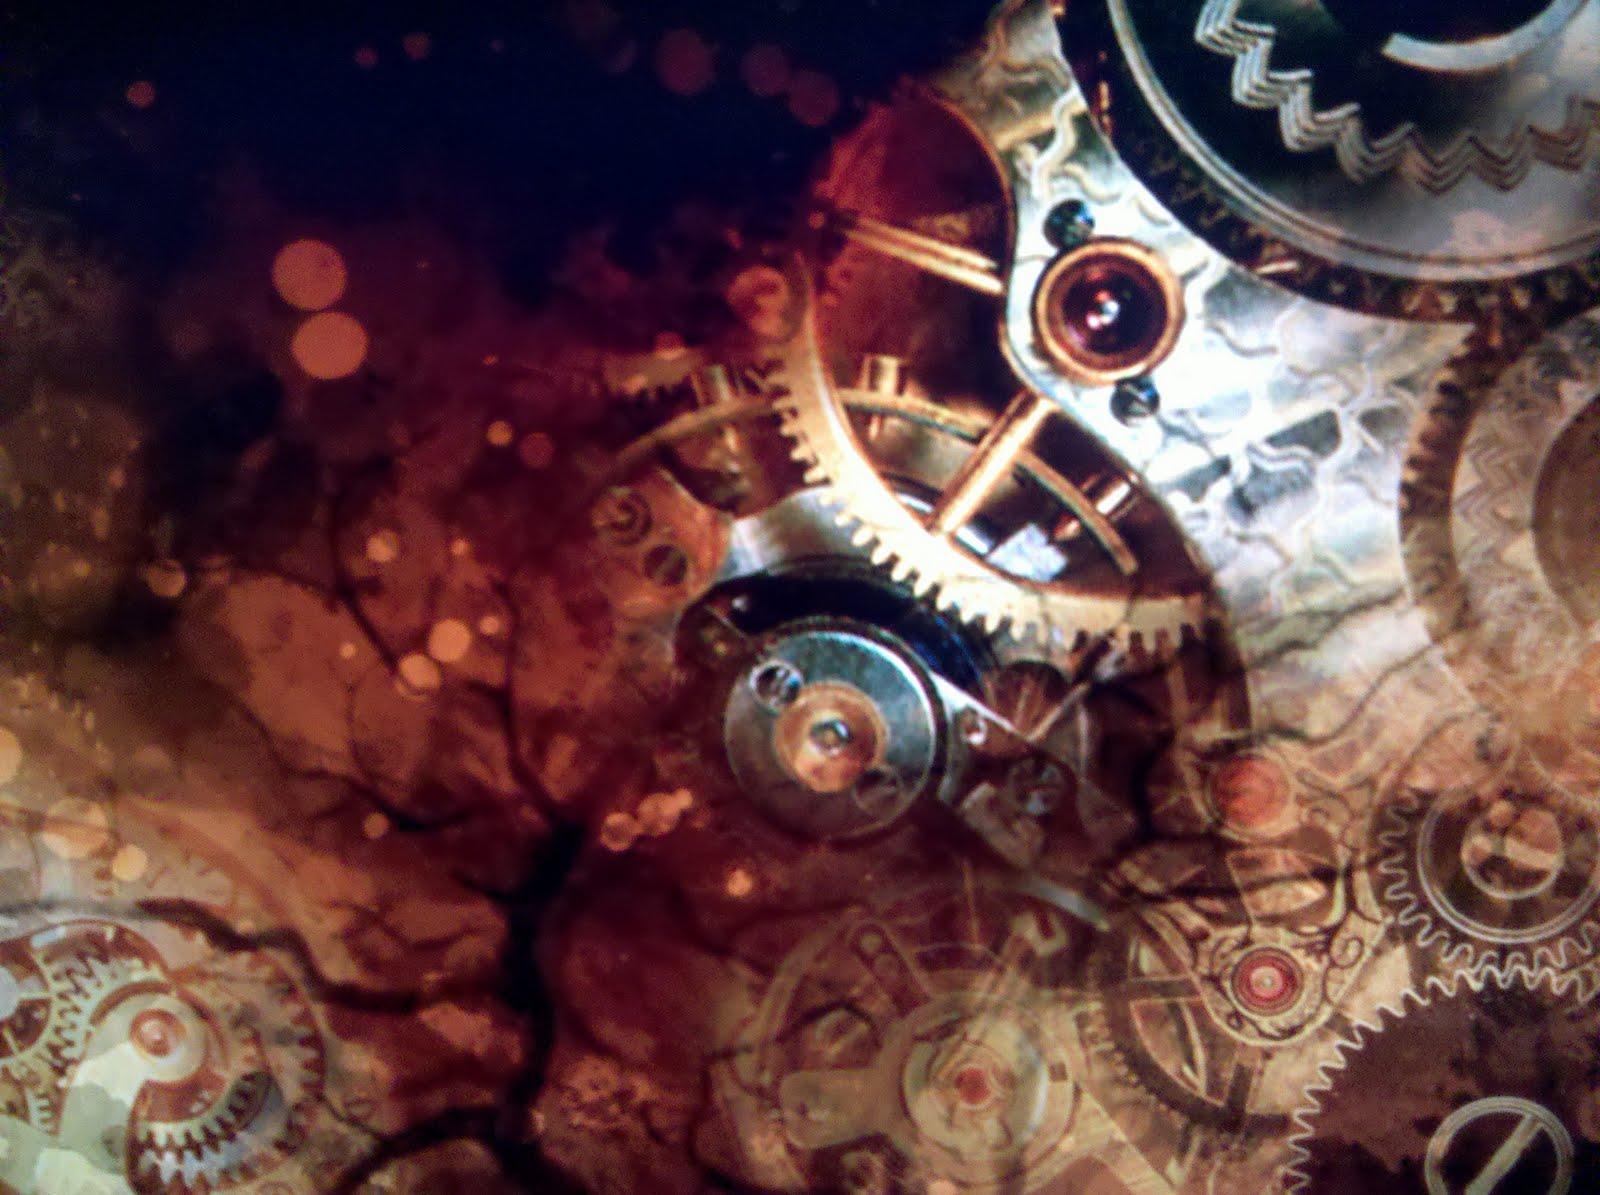 Steampunk Animated Wallpaper Wallpapersafari